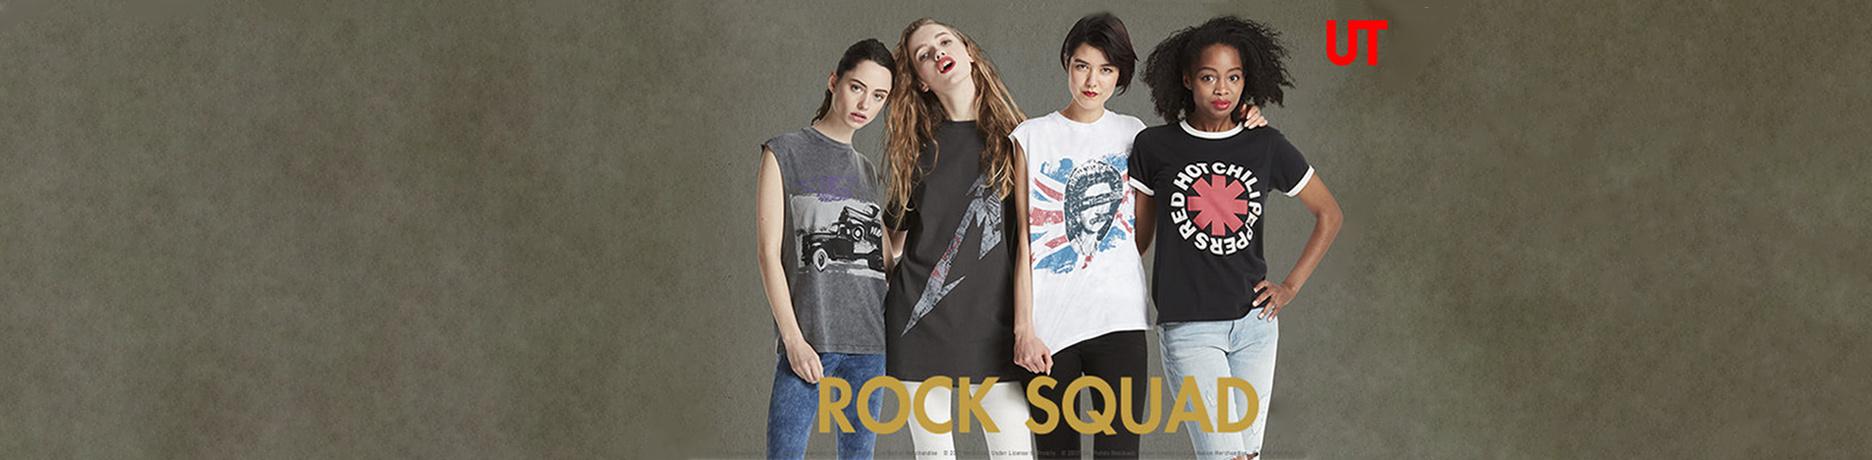 Rock Sqad